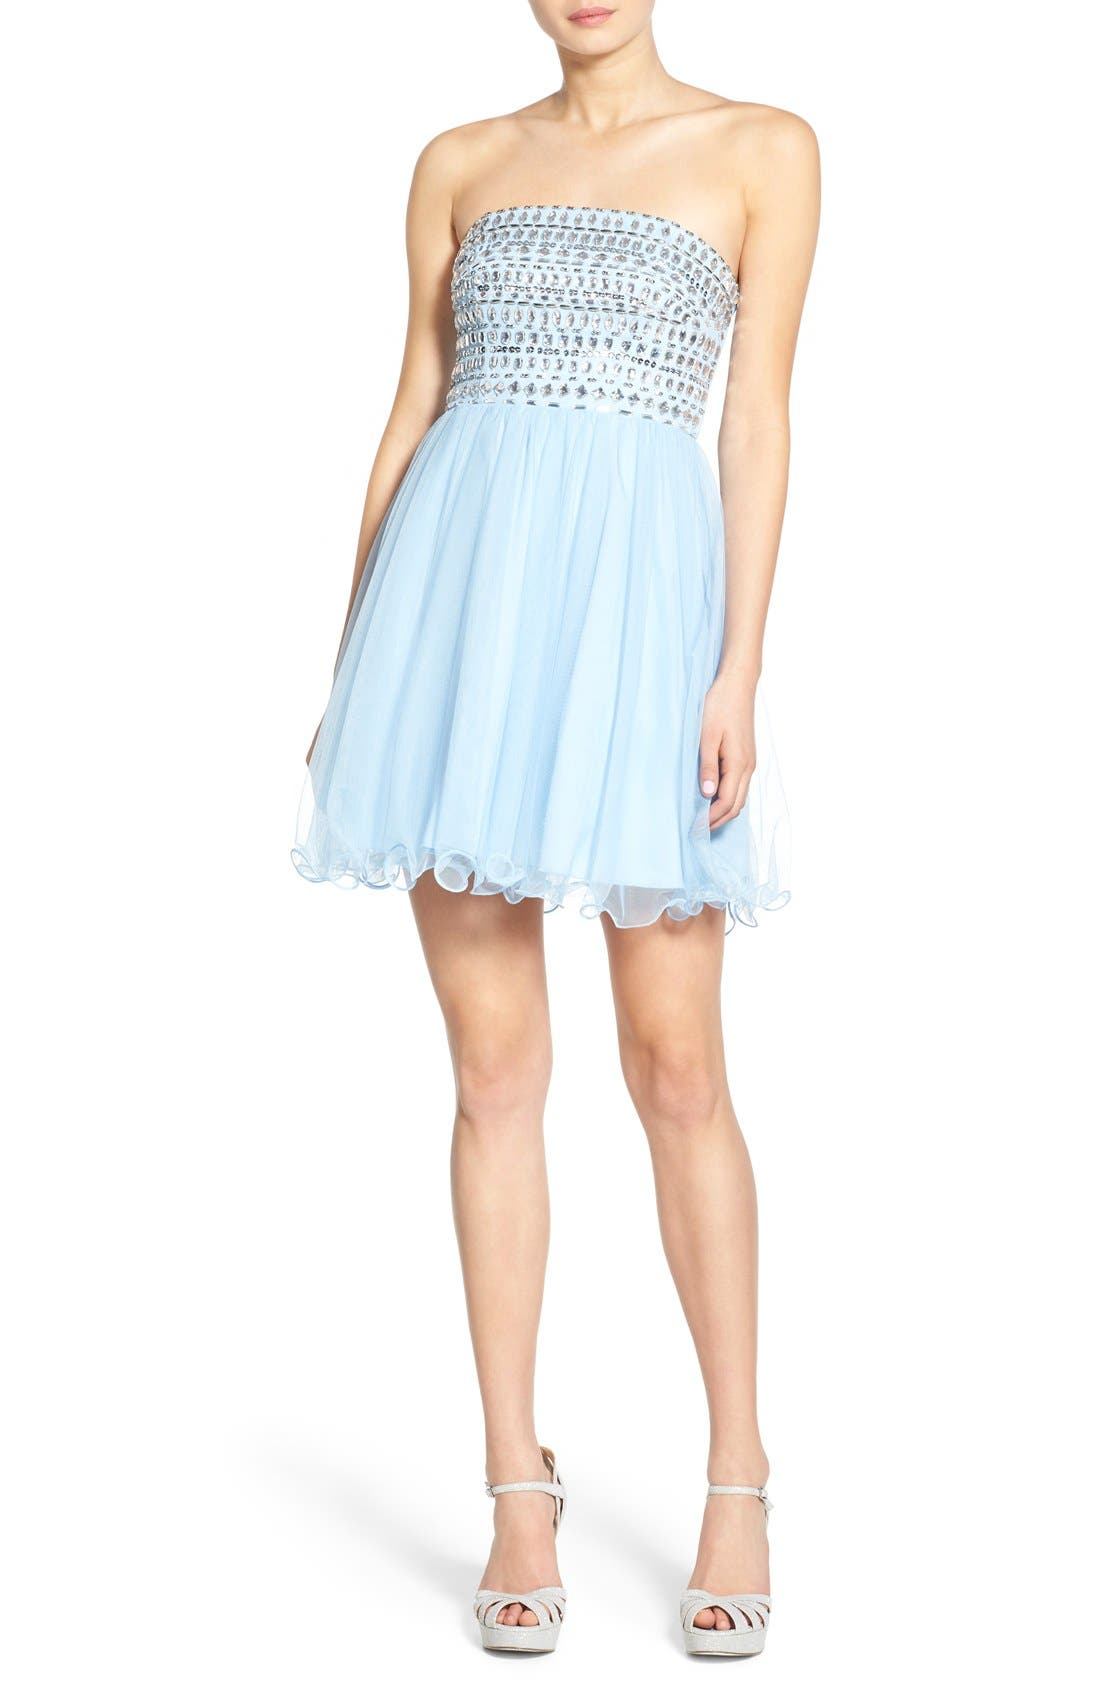 Main Image - Sequin Hearts Rhinestone Bodice Strapless Dress